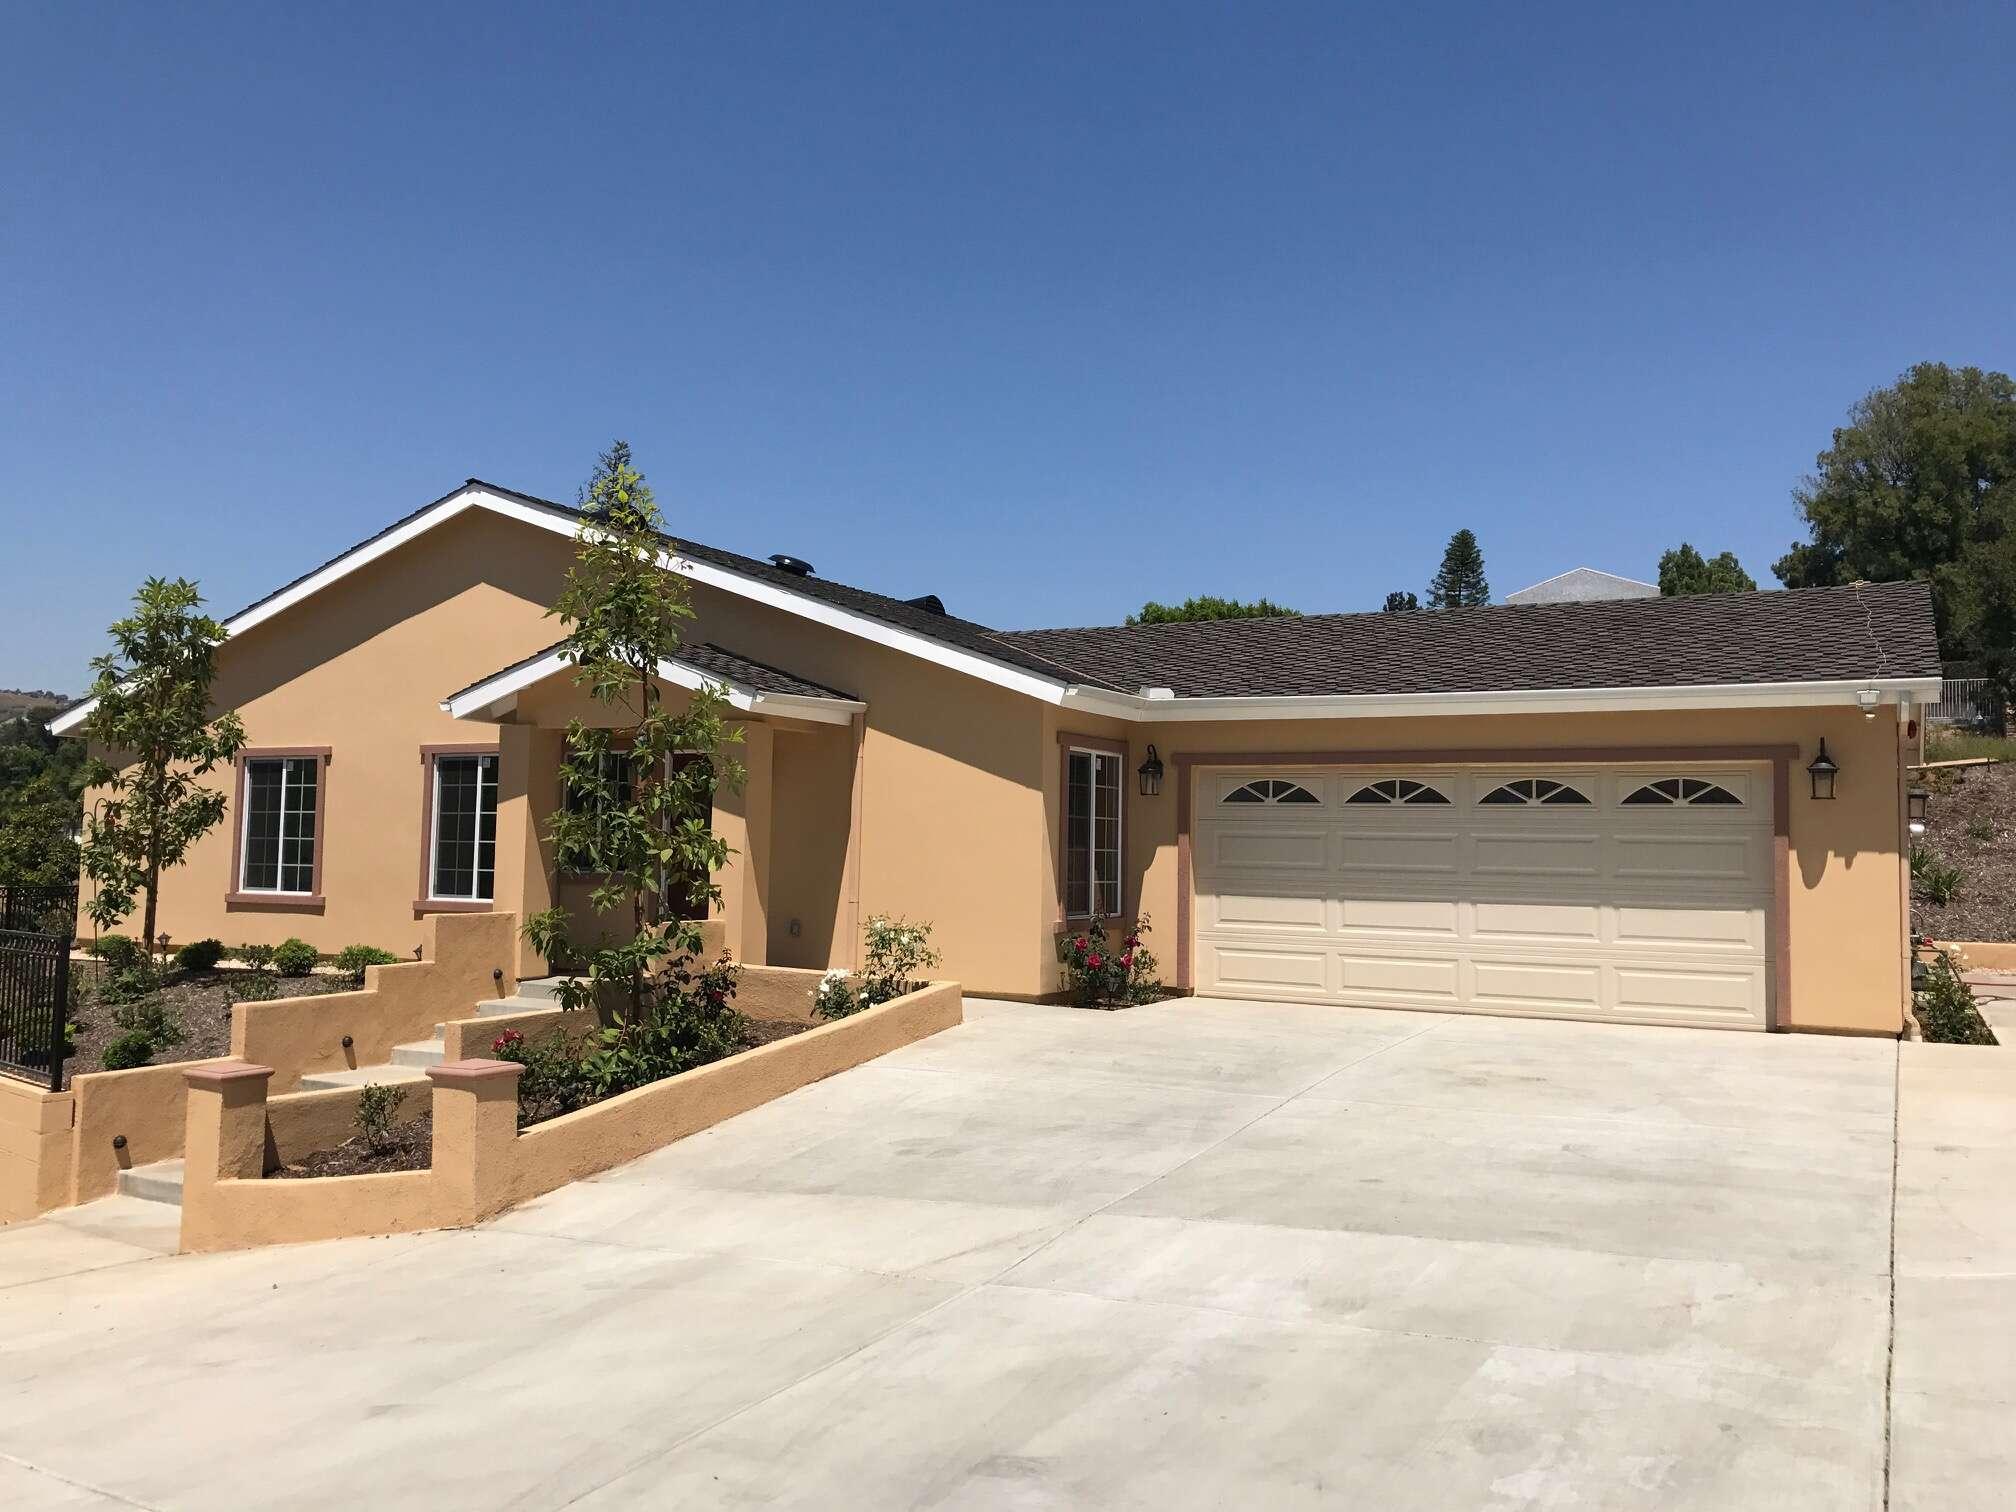 Single Family for Sale at 19401 Yorba Linda Blvd Yorba Linda, California 92886 United States